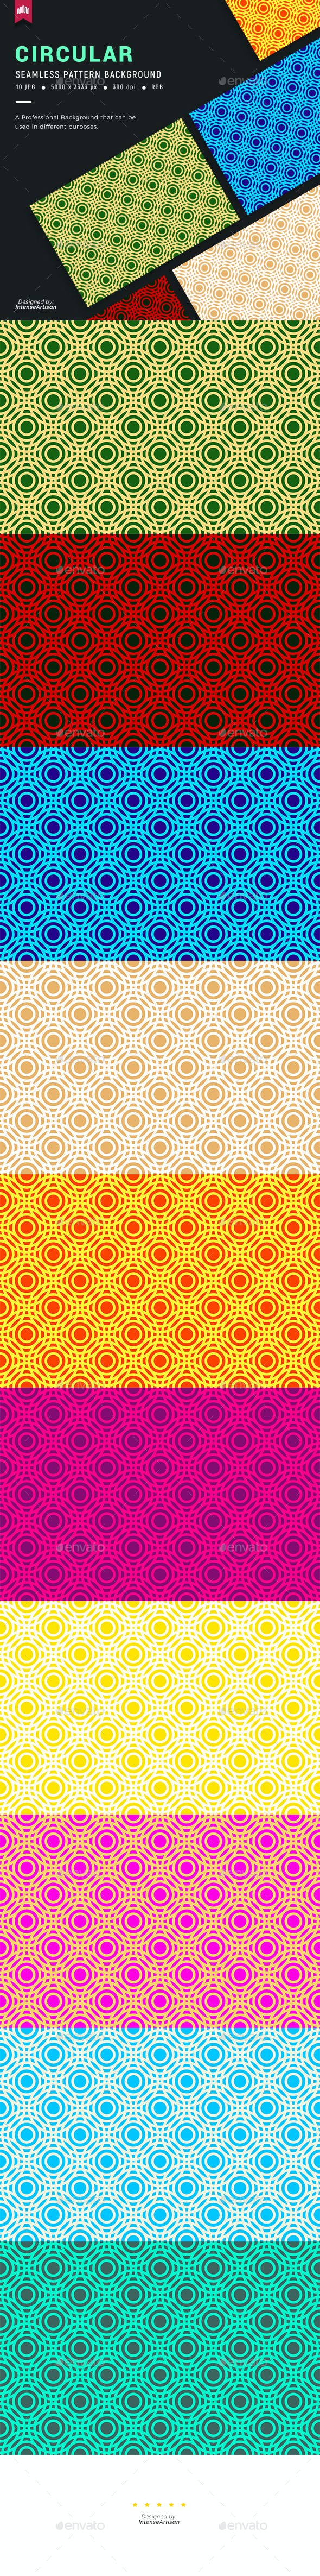 Circular Seamless Pattern Background